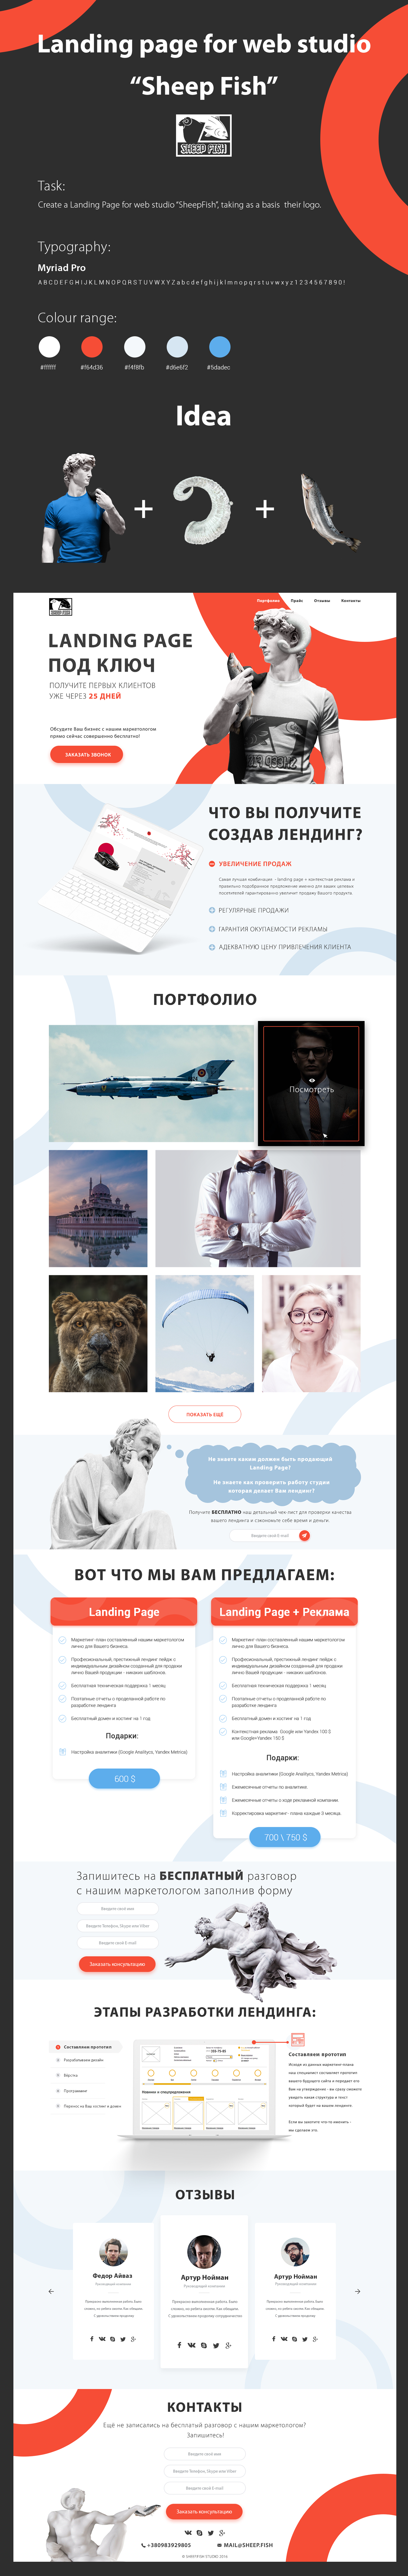 "Landing page for web sudio ""SheepFish"""